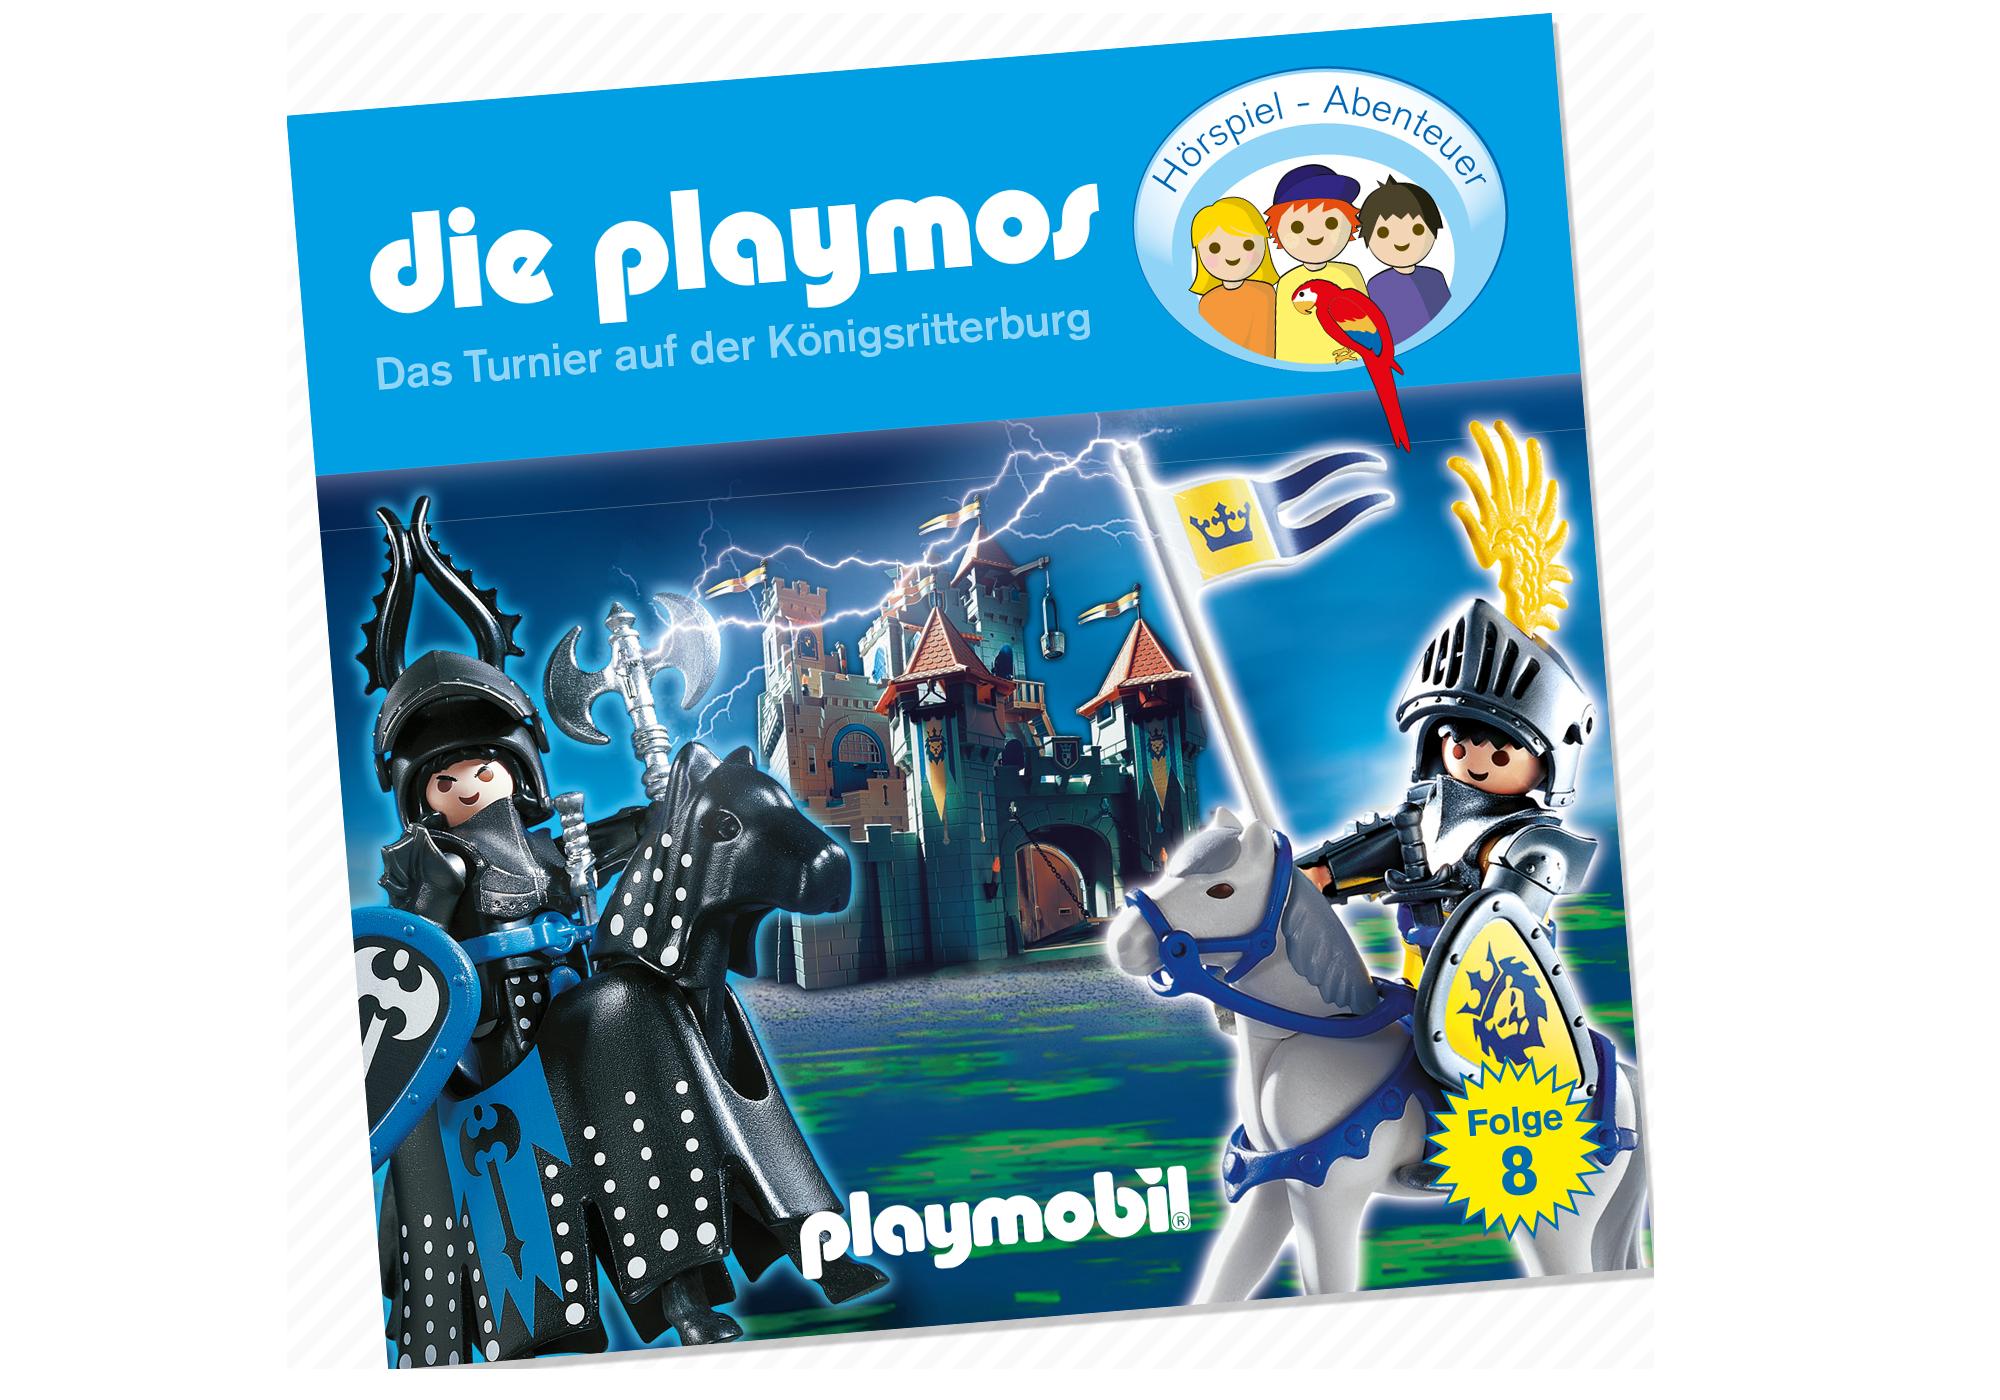 http://media.playmobil.com/i/playmobil/80163_product_detail/Das Turnier auf der Königsburg (8) - CD